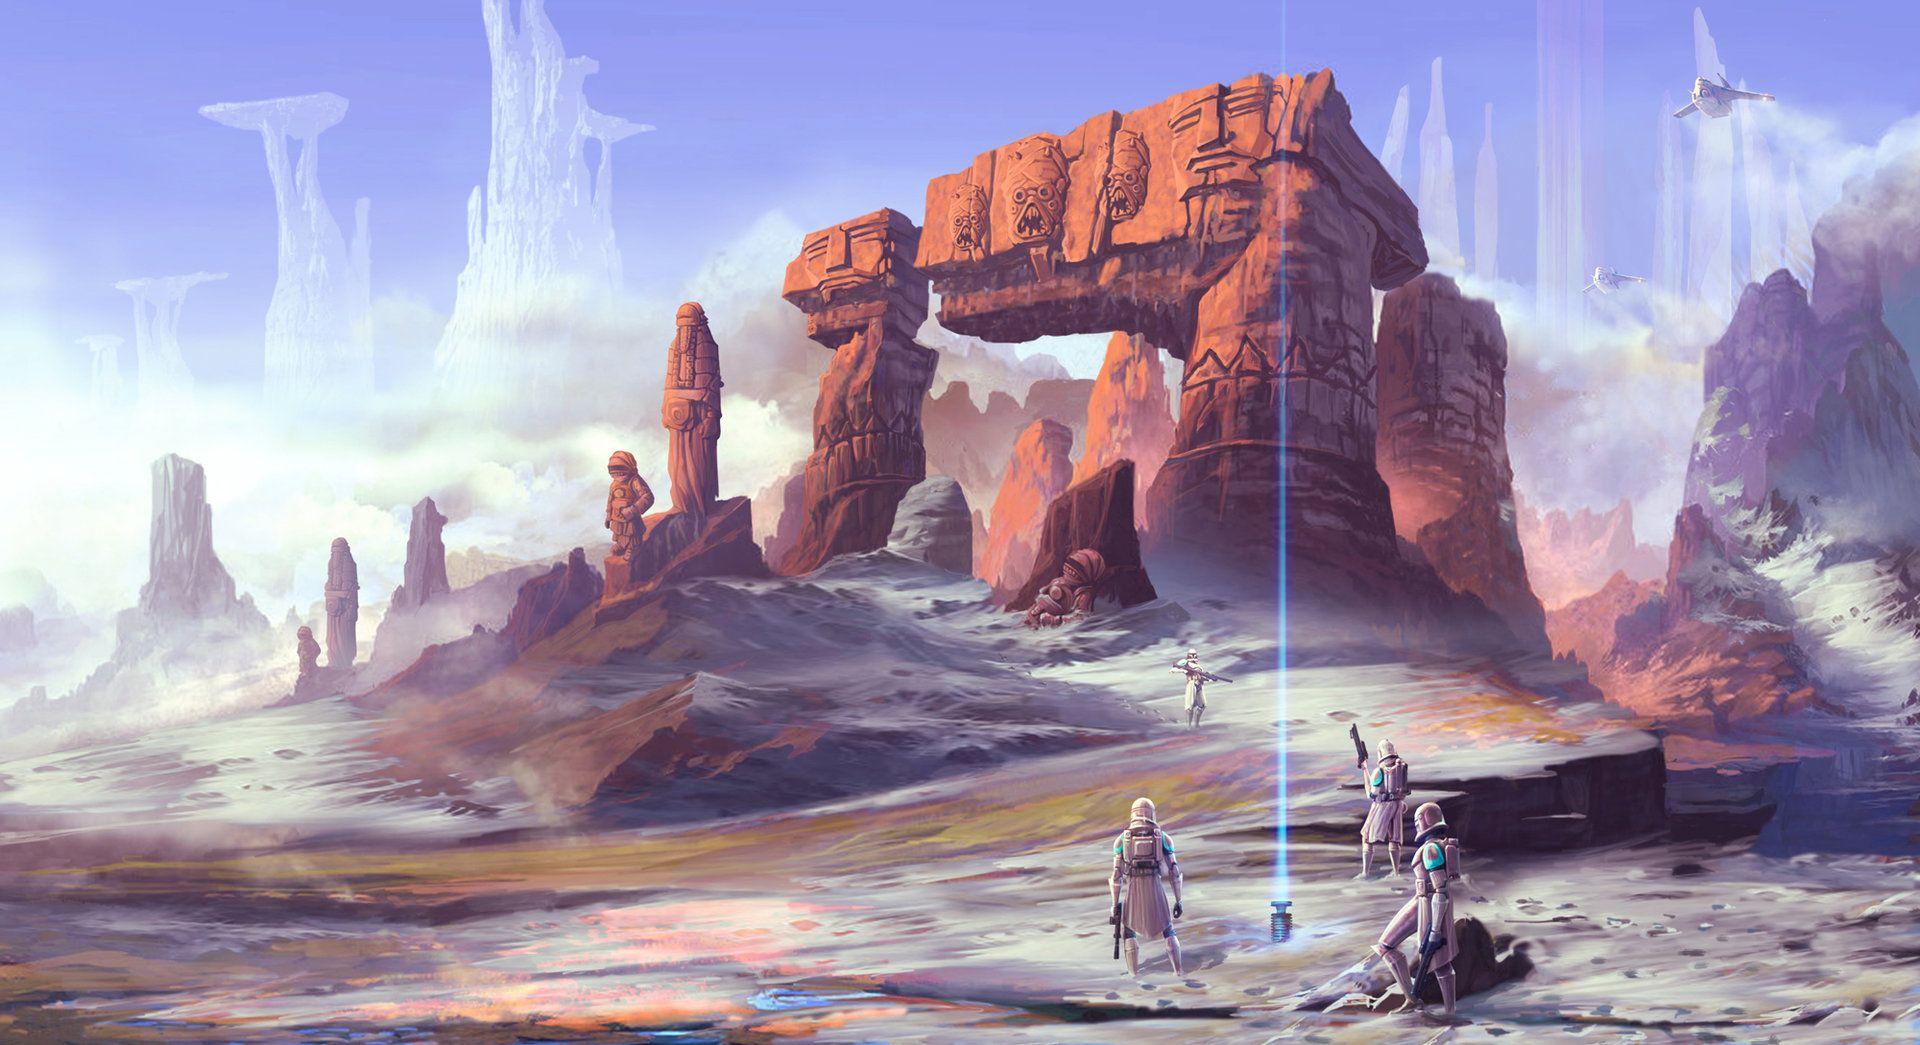 https://www.artstation.com/artwork/tusken-raider-lost-planet